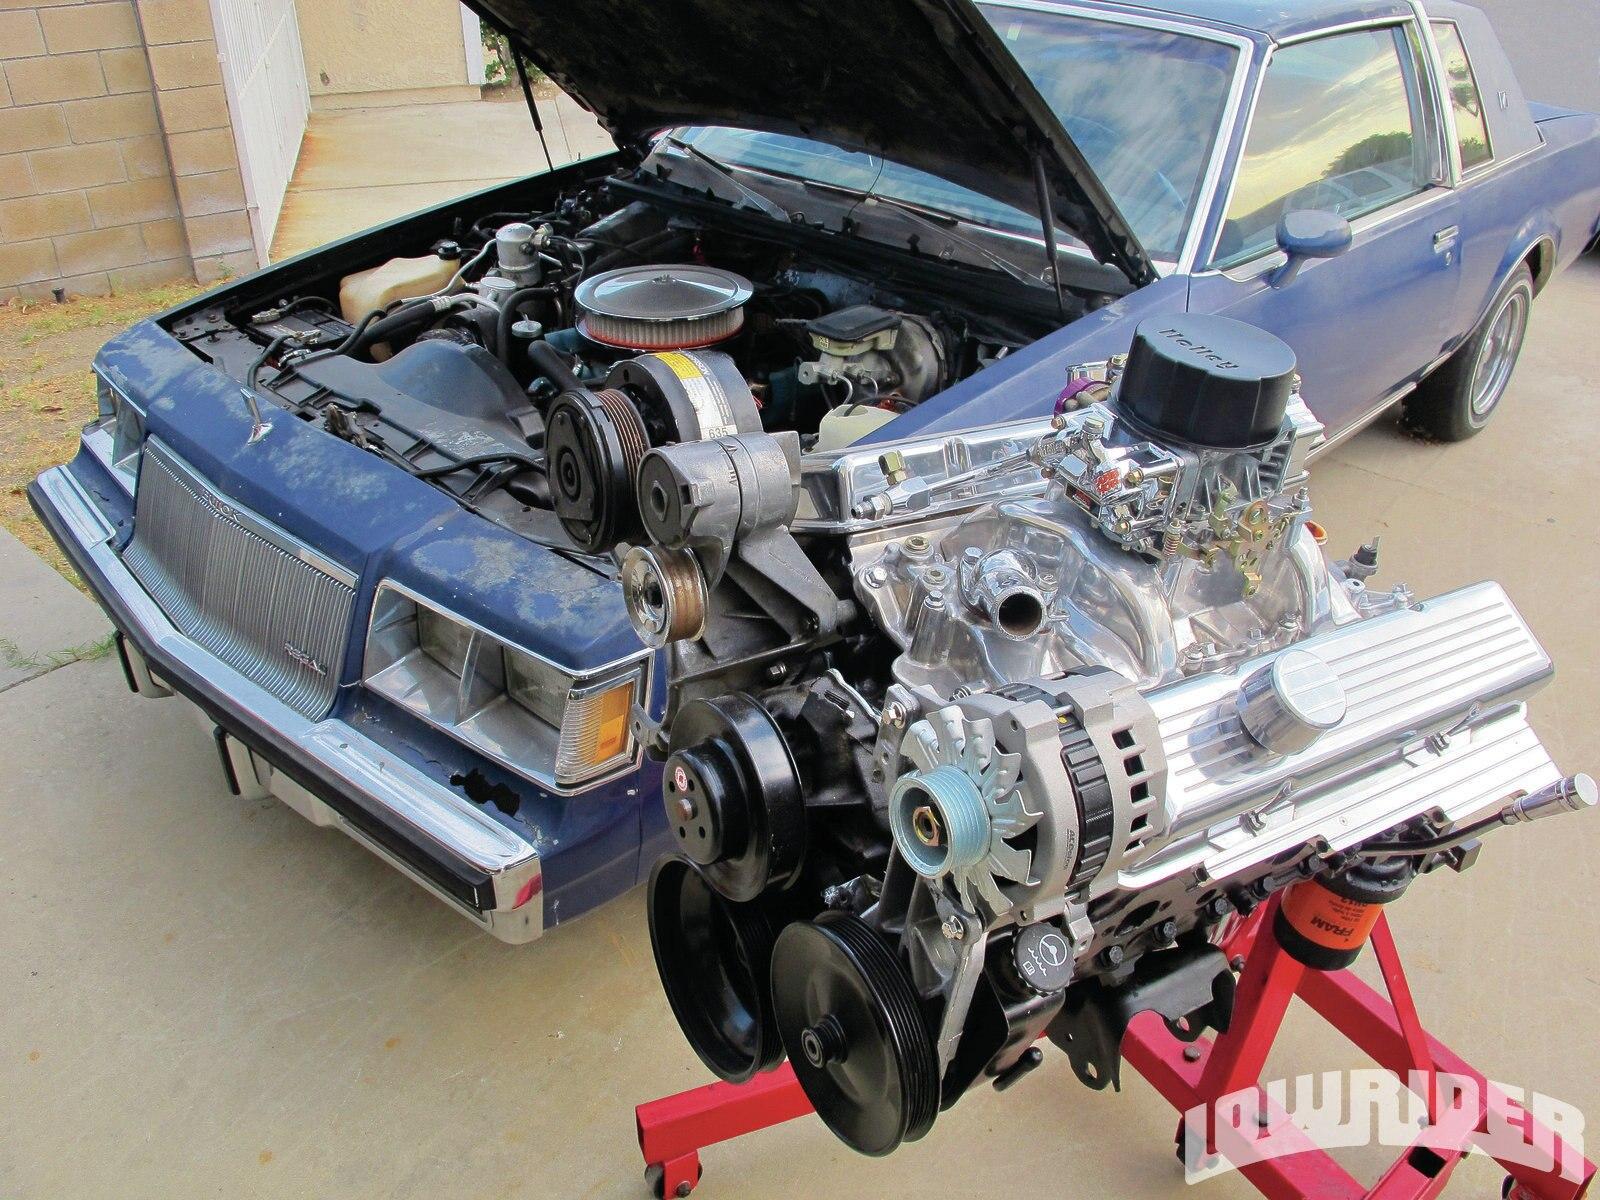 lrmp-1301-01-o-1984-buick-regal-engine-swap-small-block1